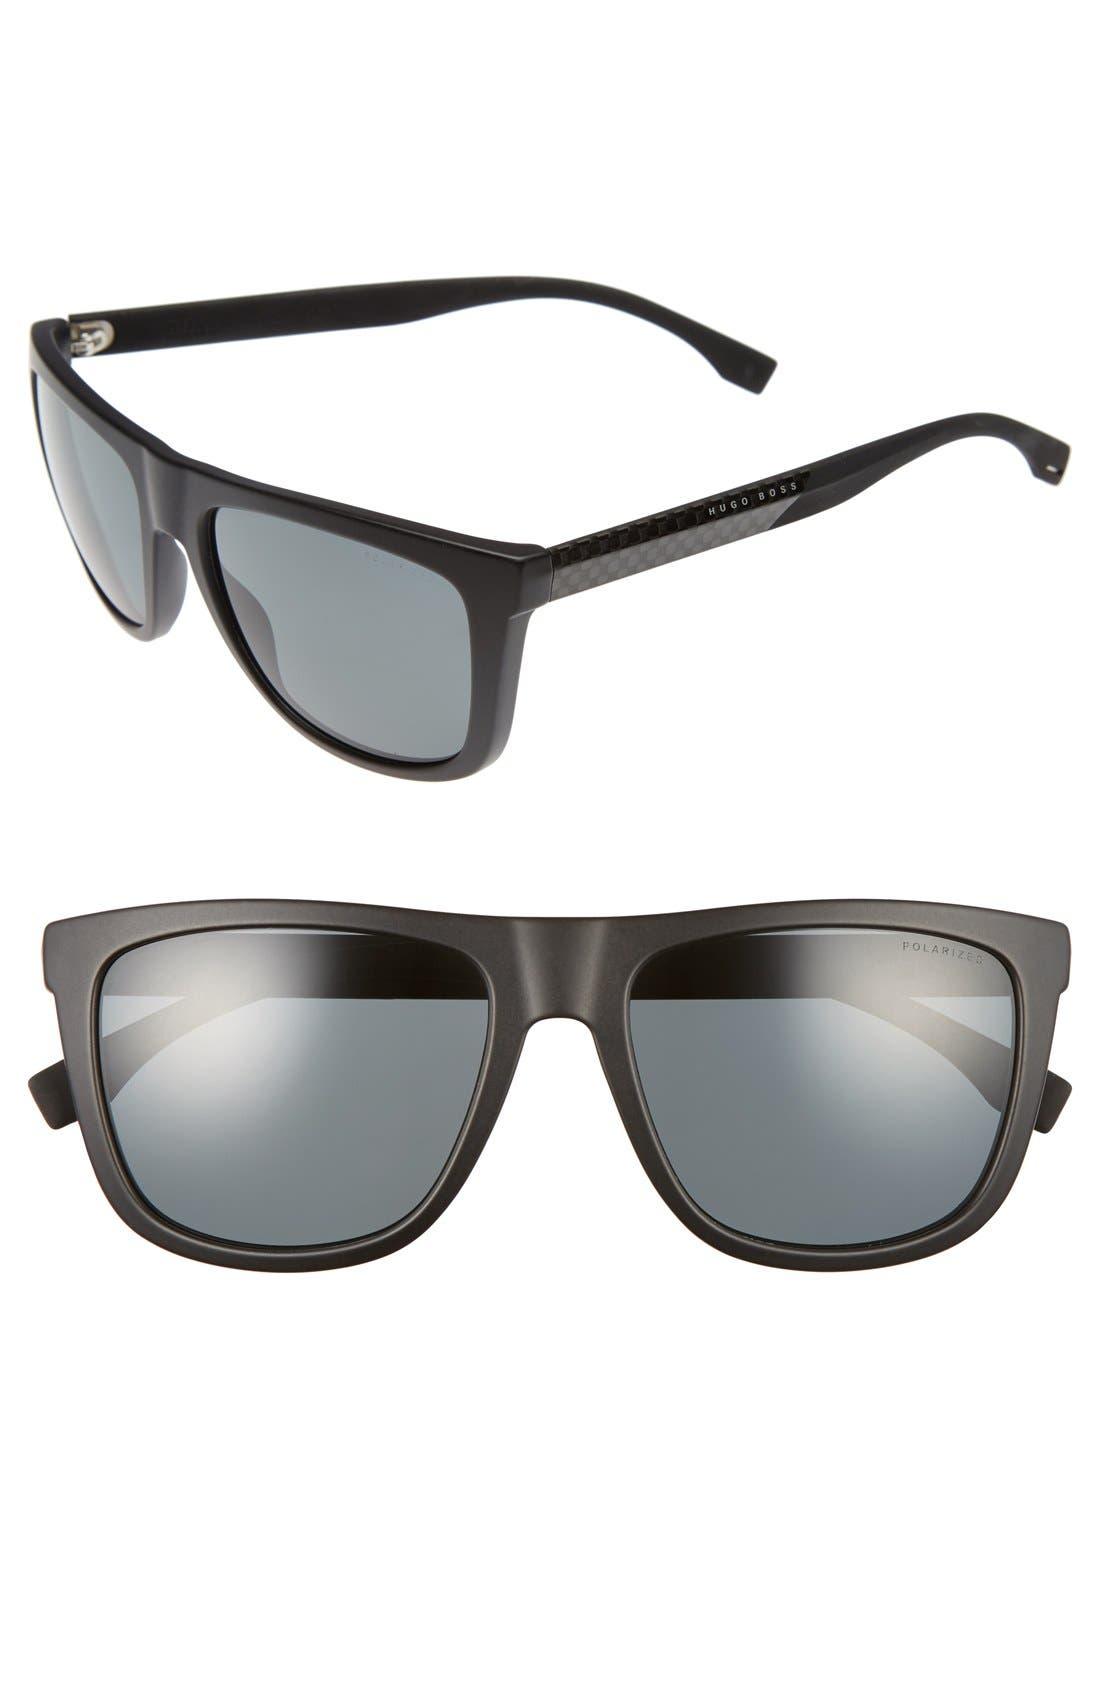 56mm Polarized Sunglasses,                             Main thumbnail 1, color,                             Black Carbon